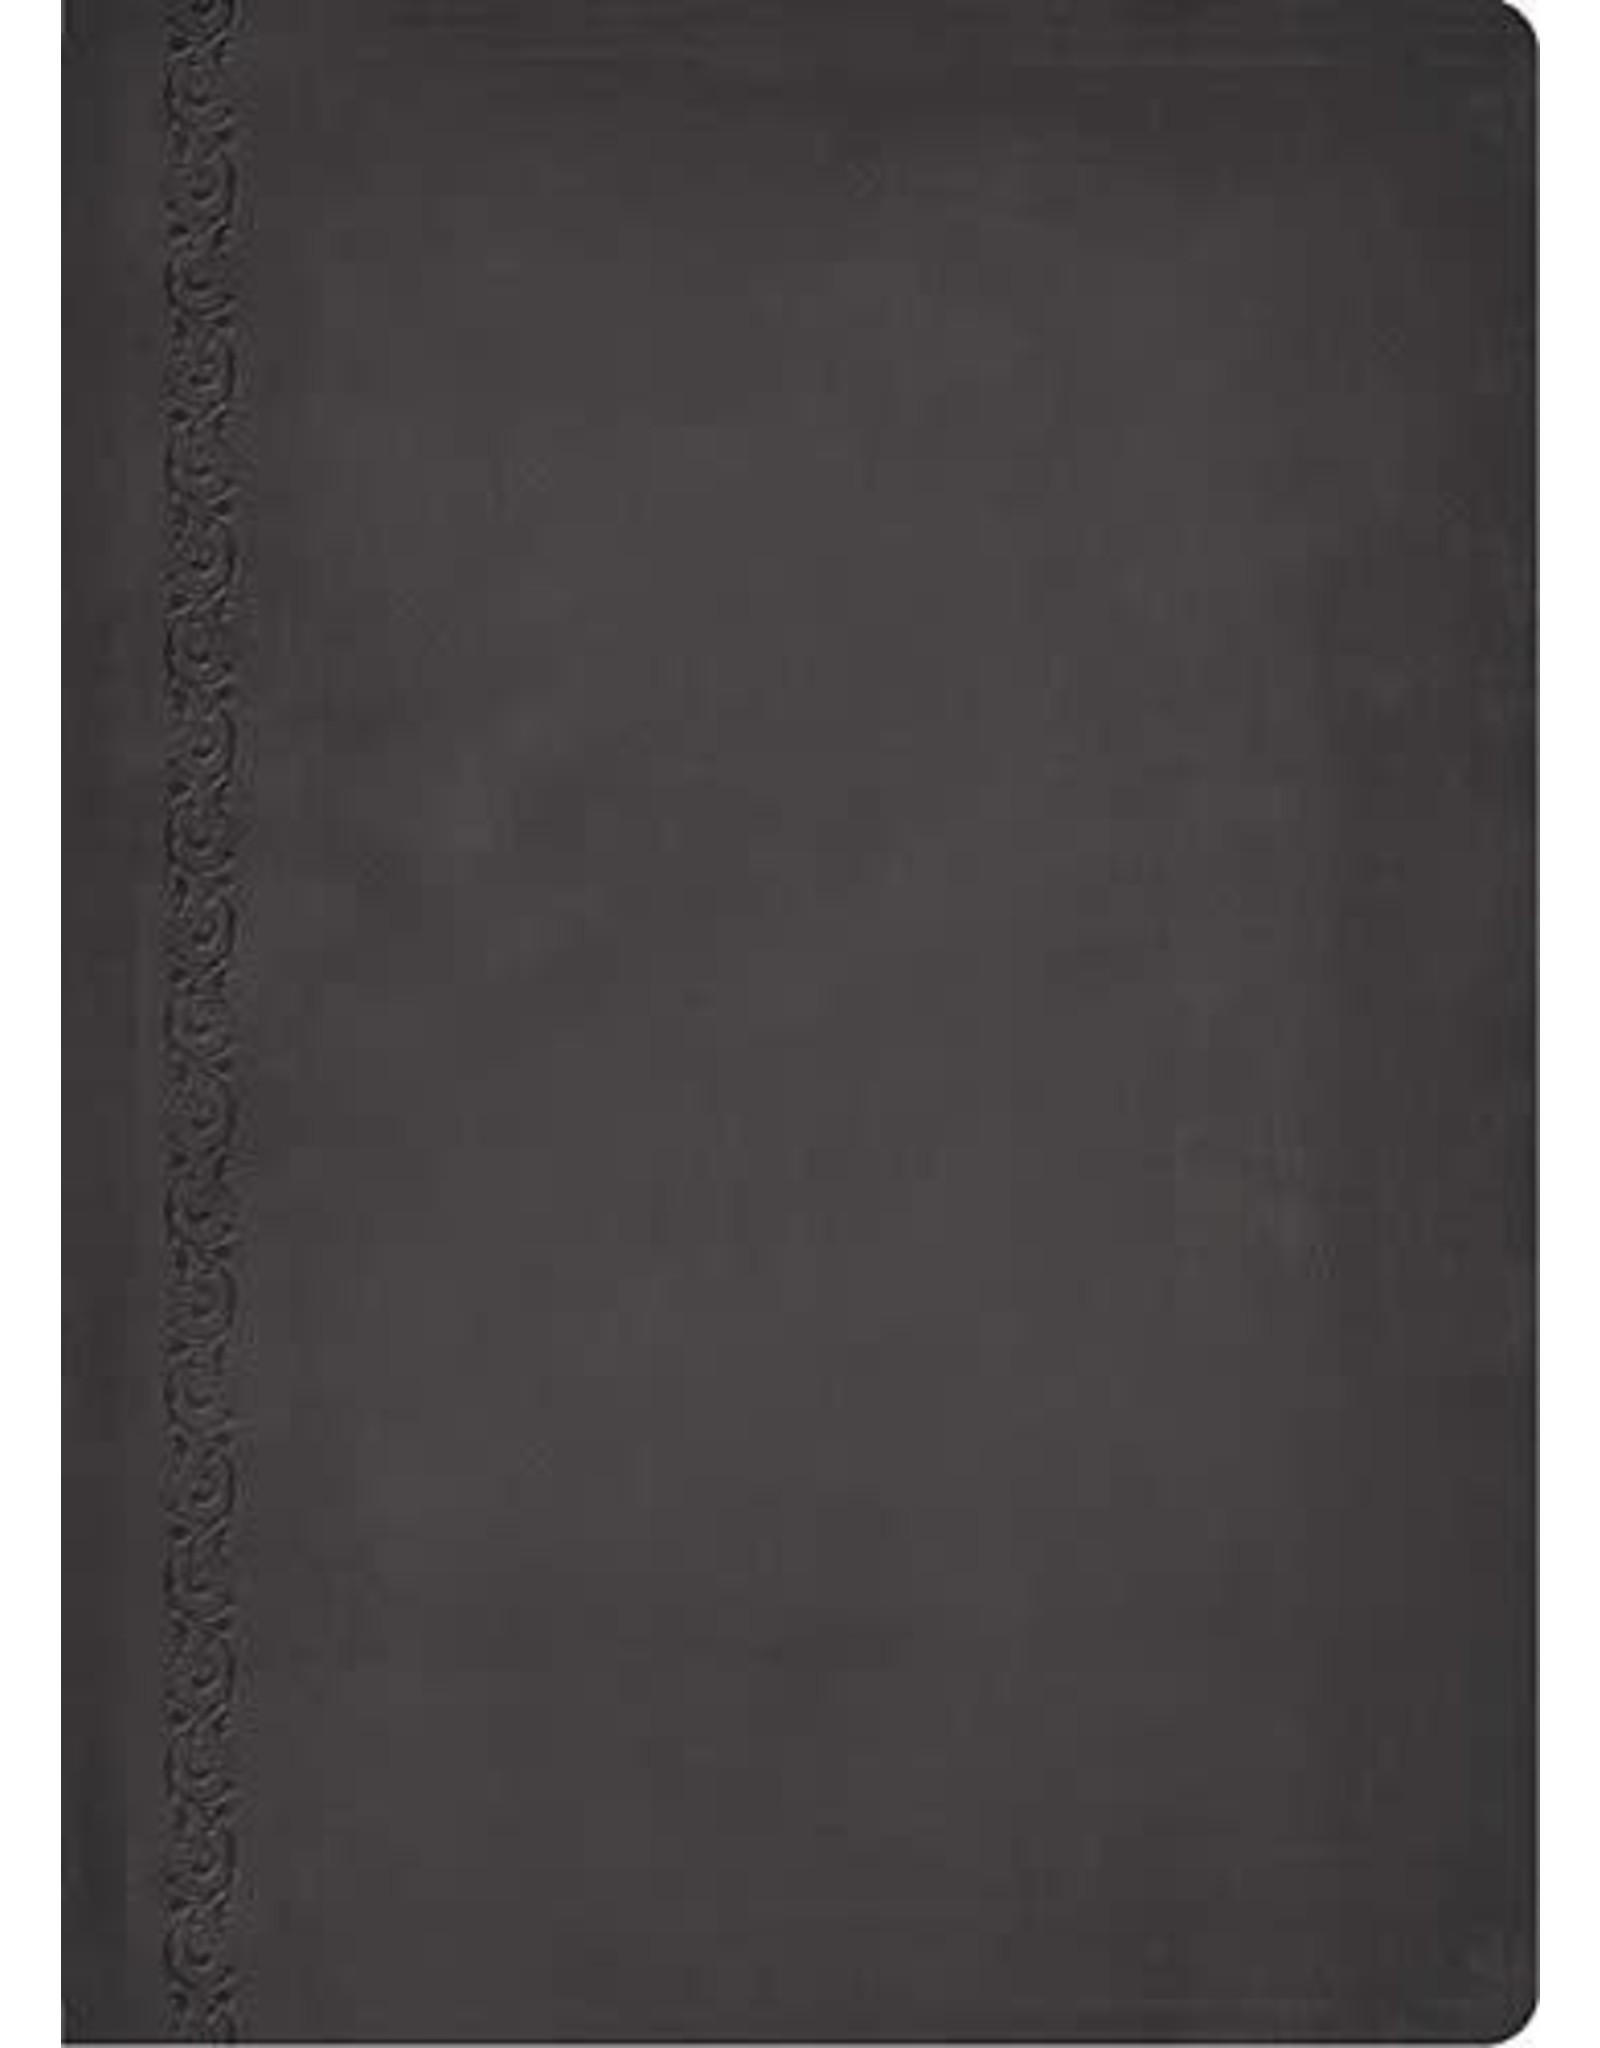 Harper Collins / Thomas Nelson / Zondervan MacArthur Study Bible: NKJV Leathersoft Raven Indexed